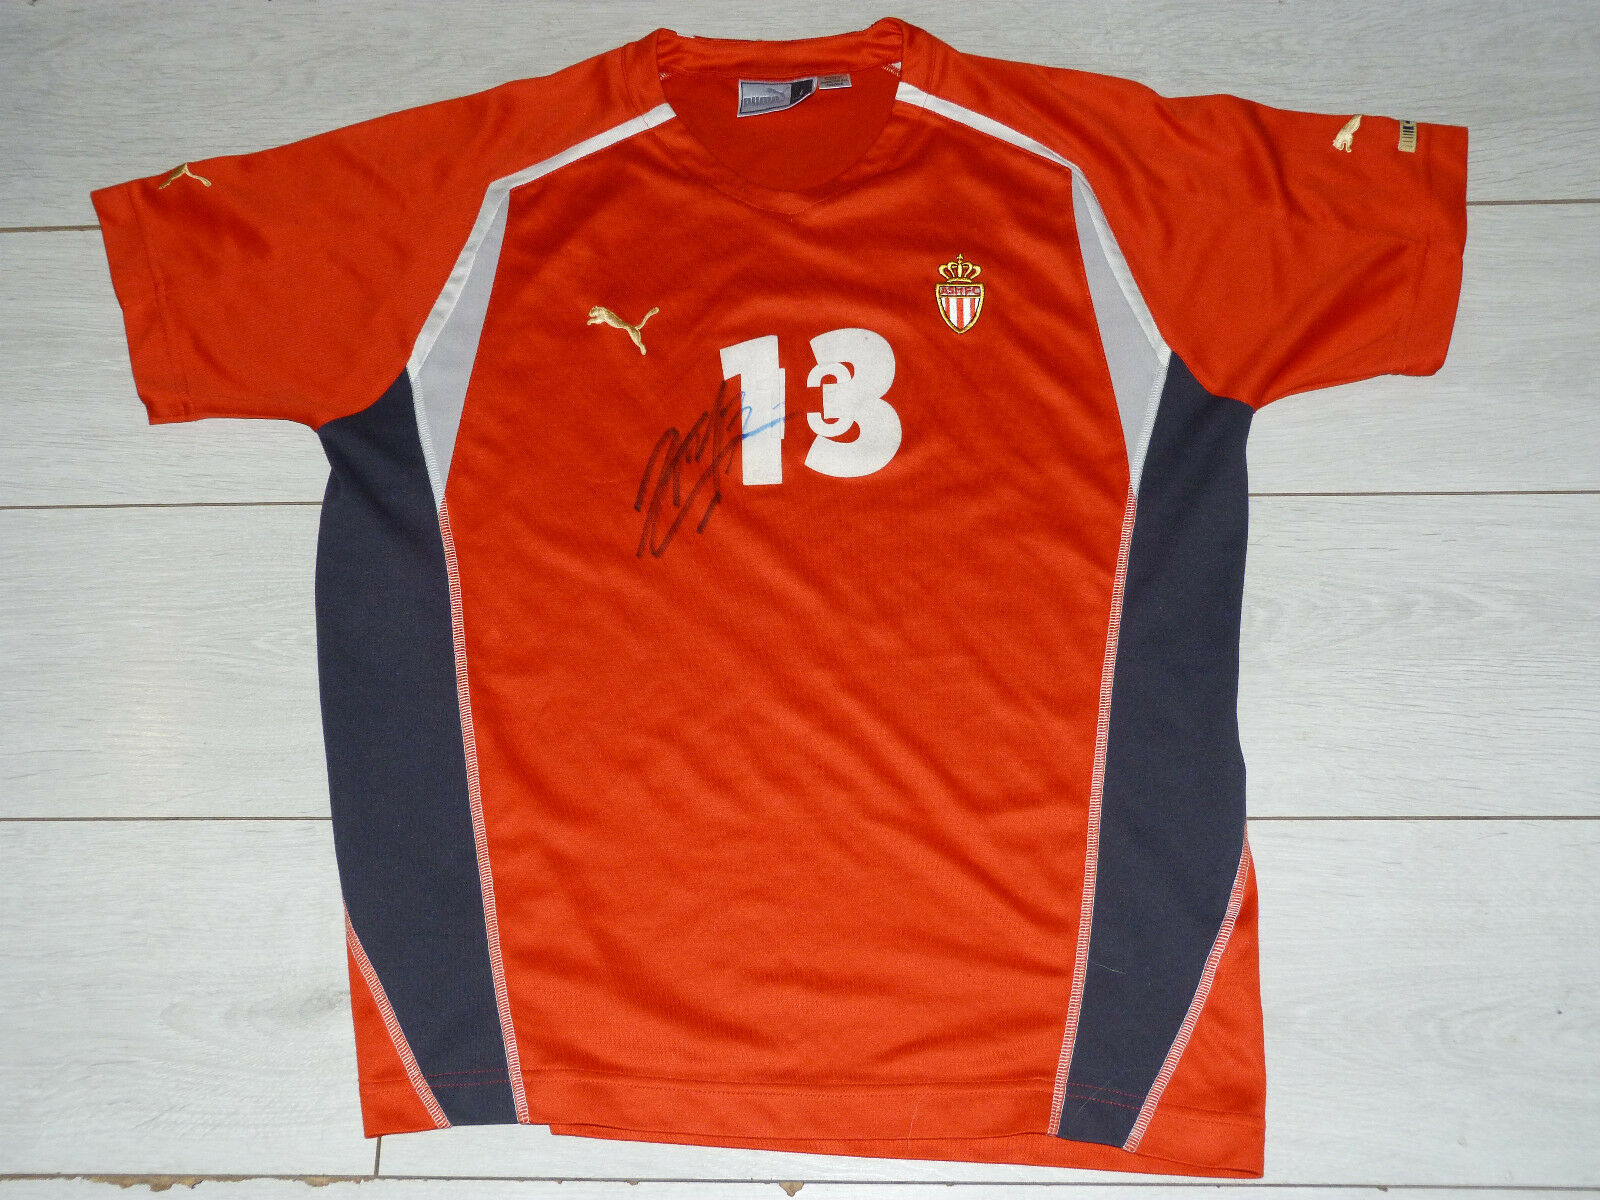 Maillot porté signé signed worn jersey DOUGLAS MAICON asm AS MONACO FC foot